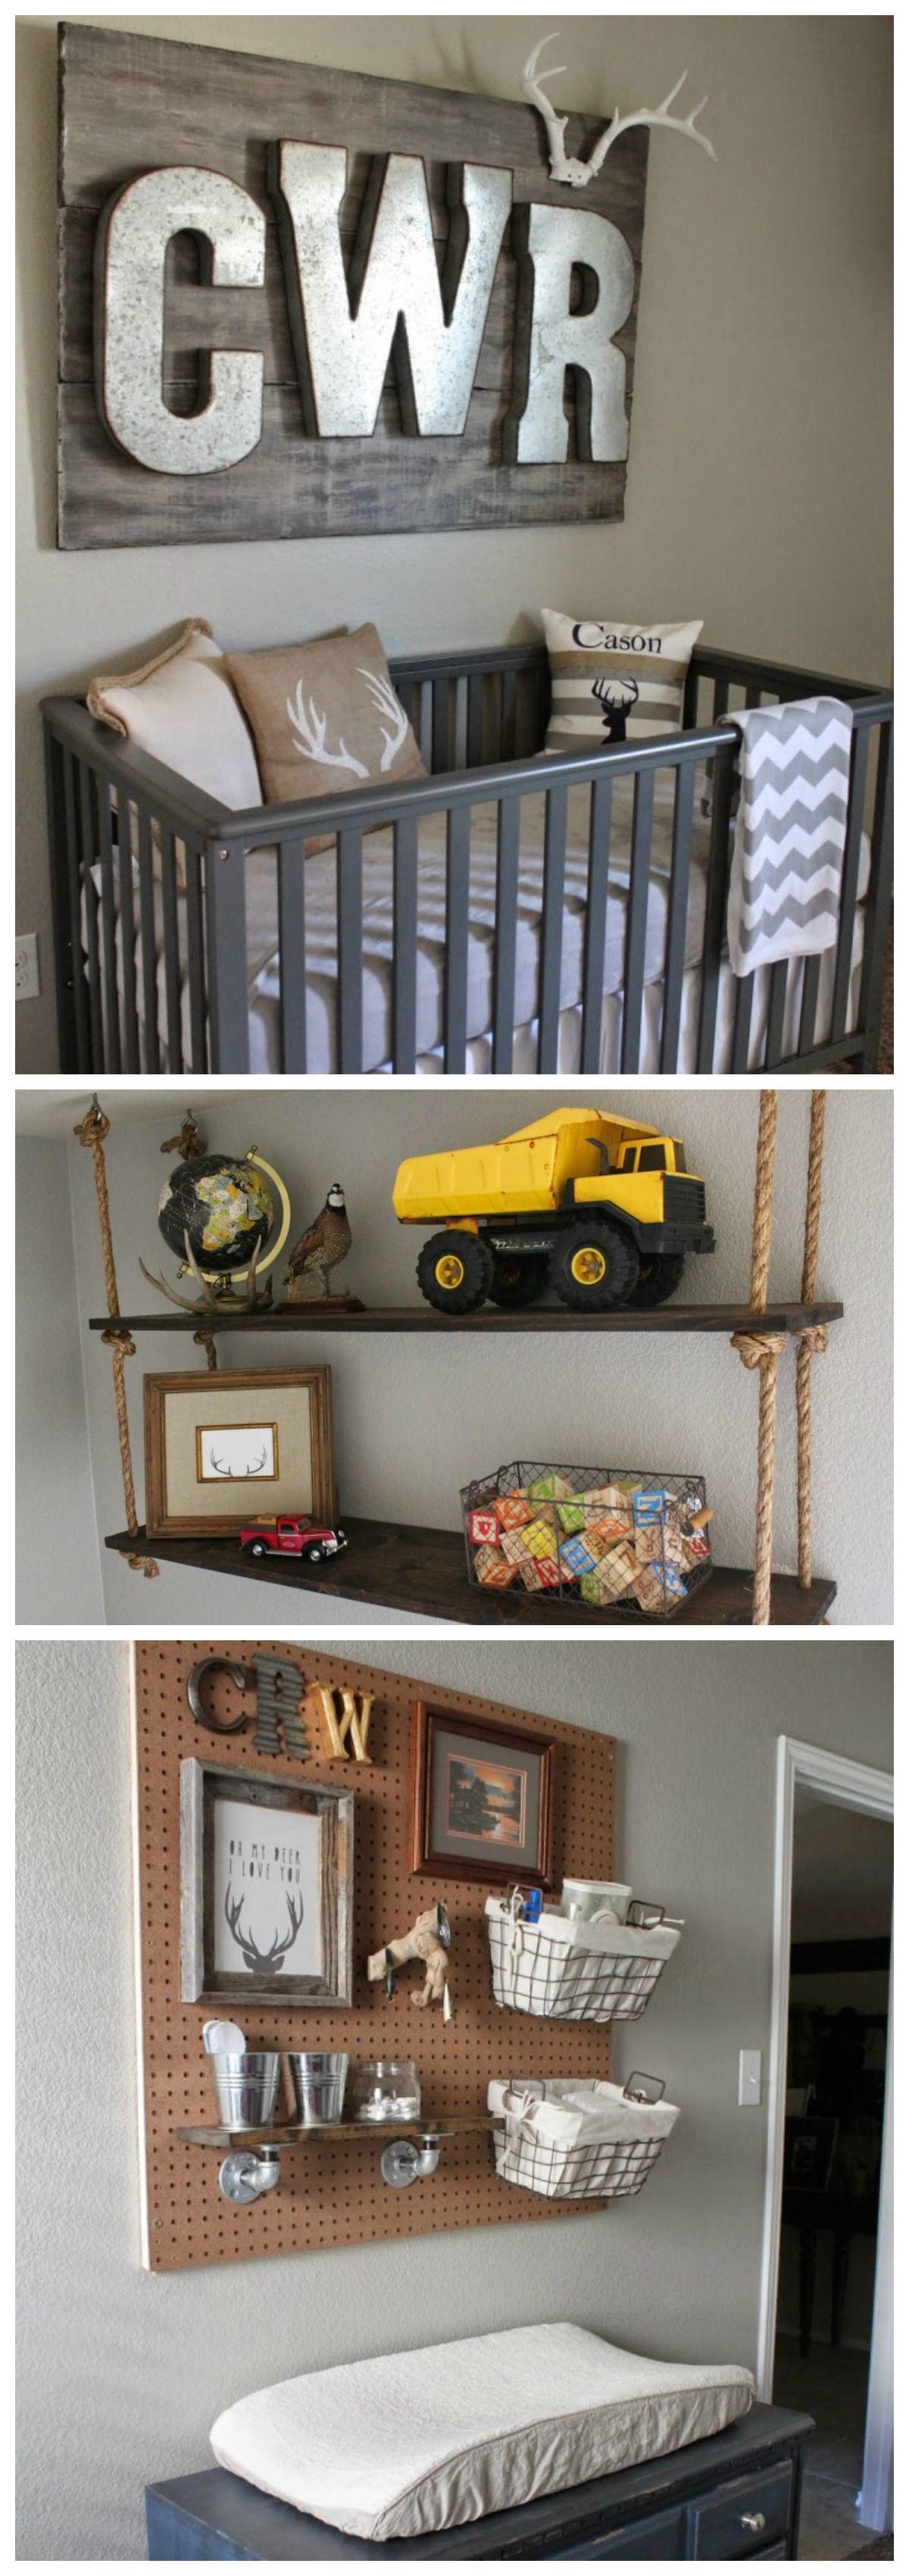 Cason S Hunting And Fishing Nursery Project Nursery Baby Boy Rooms Baby Decor Boy Room